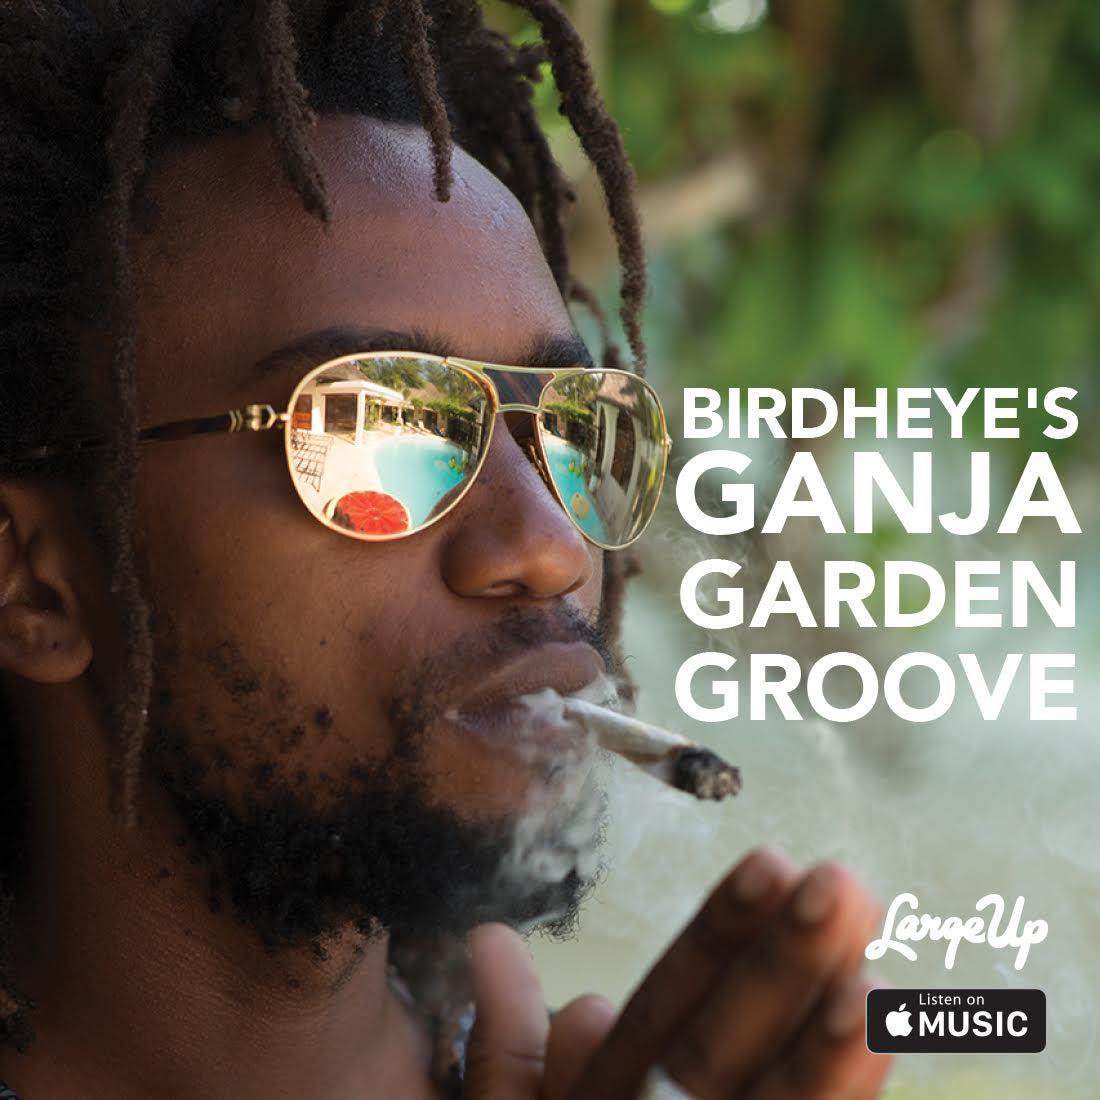 Ganja-Garden-Groove-Apple-Music-Logos